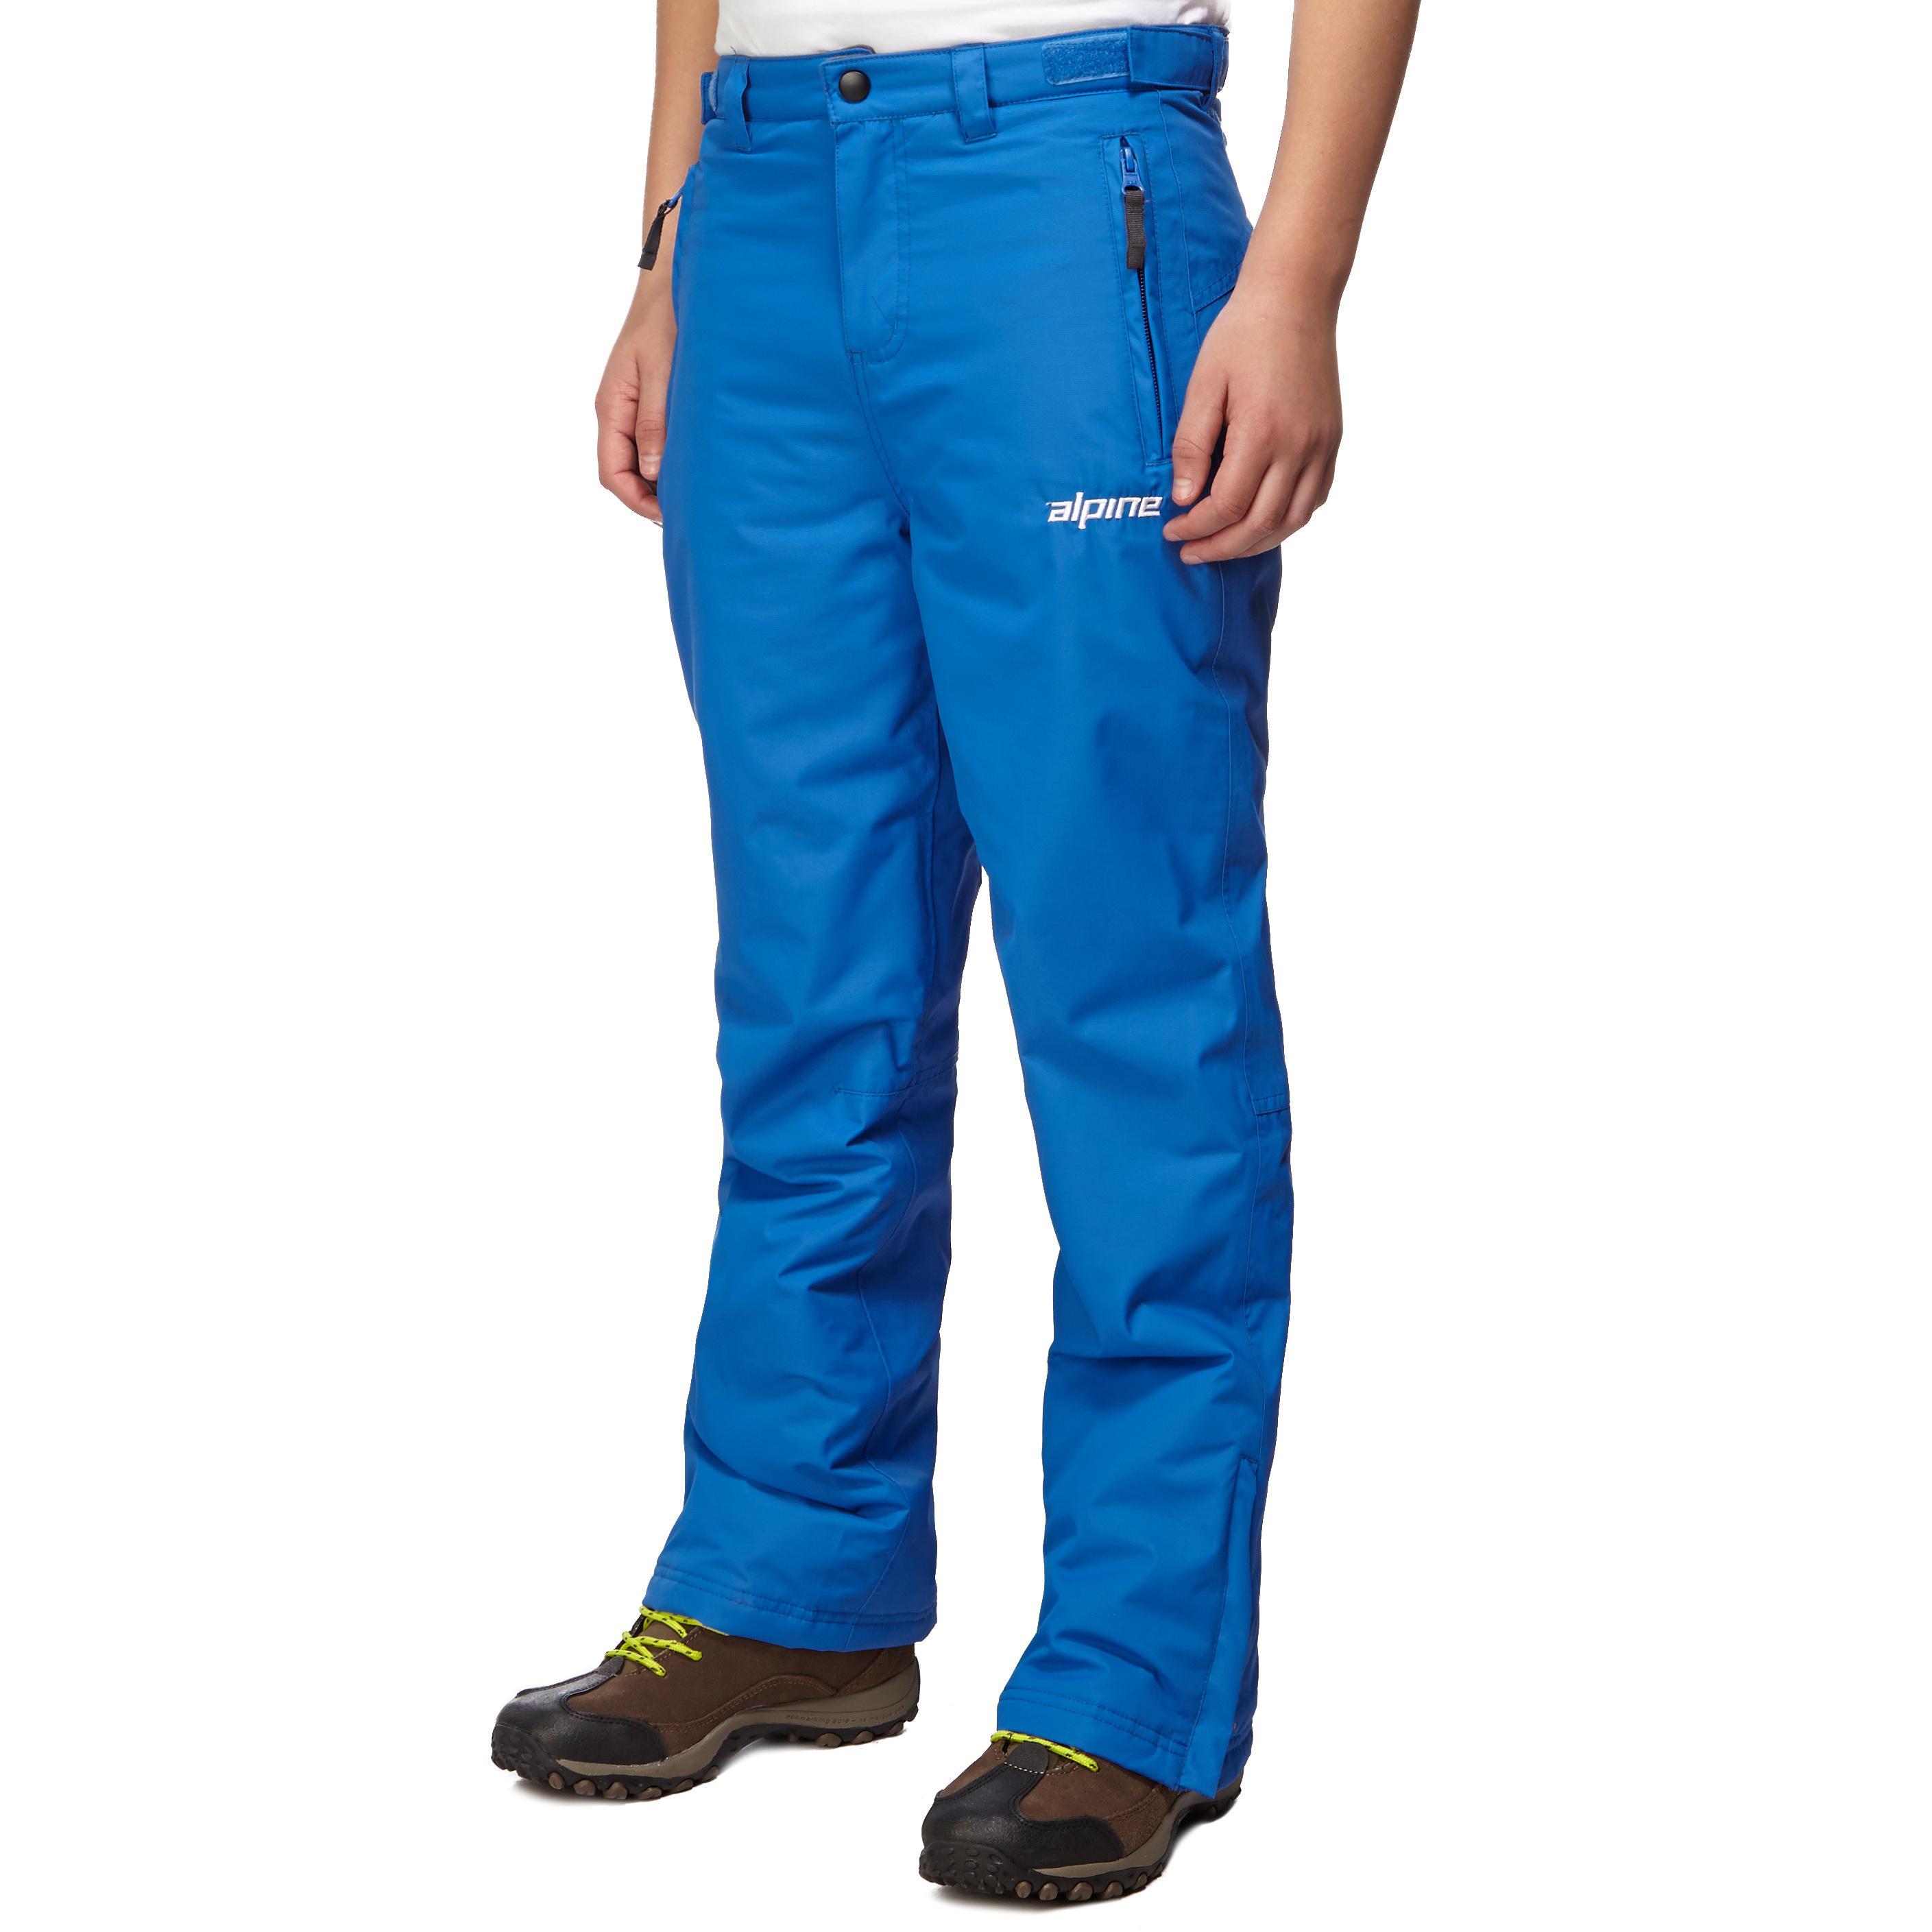 Alpine Boys' Salopettes, Blue